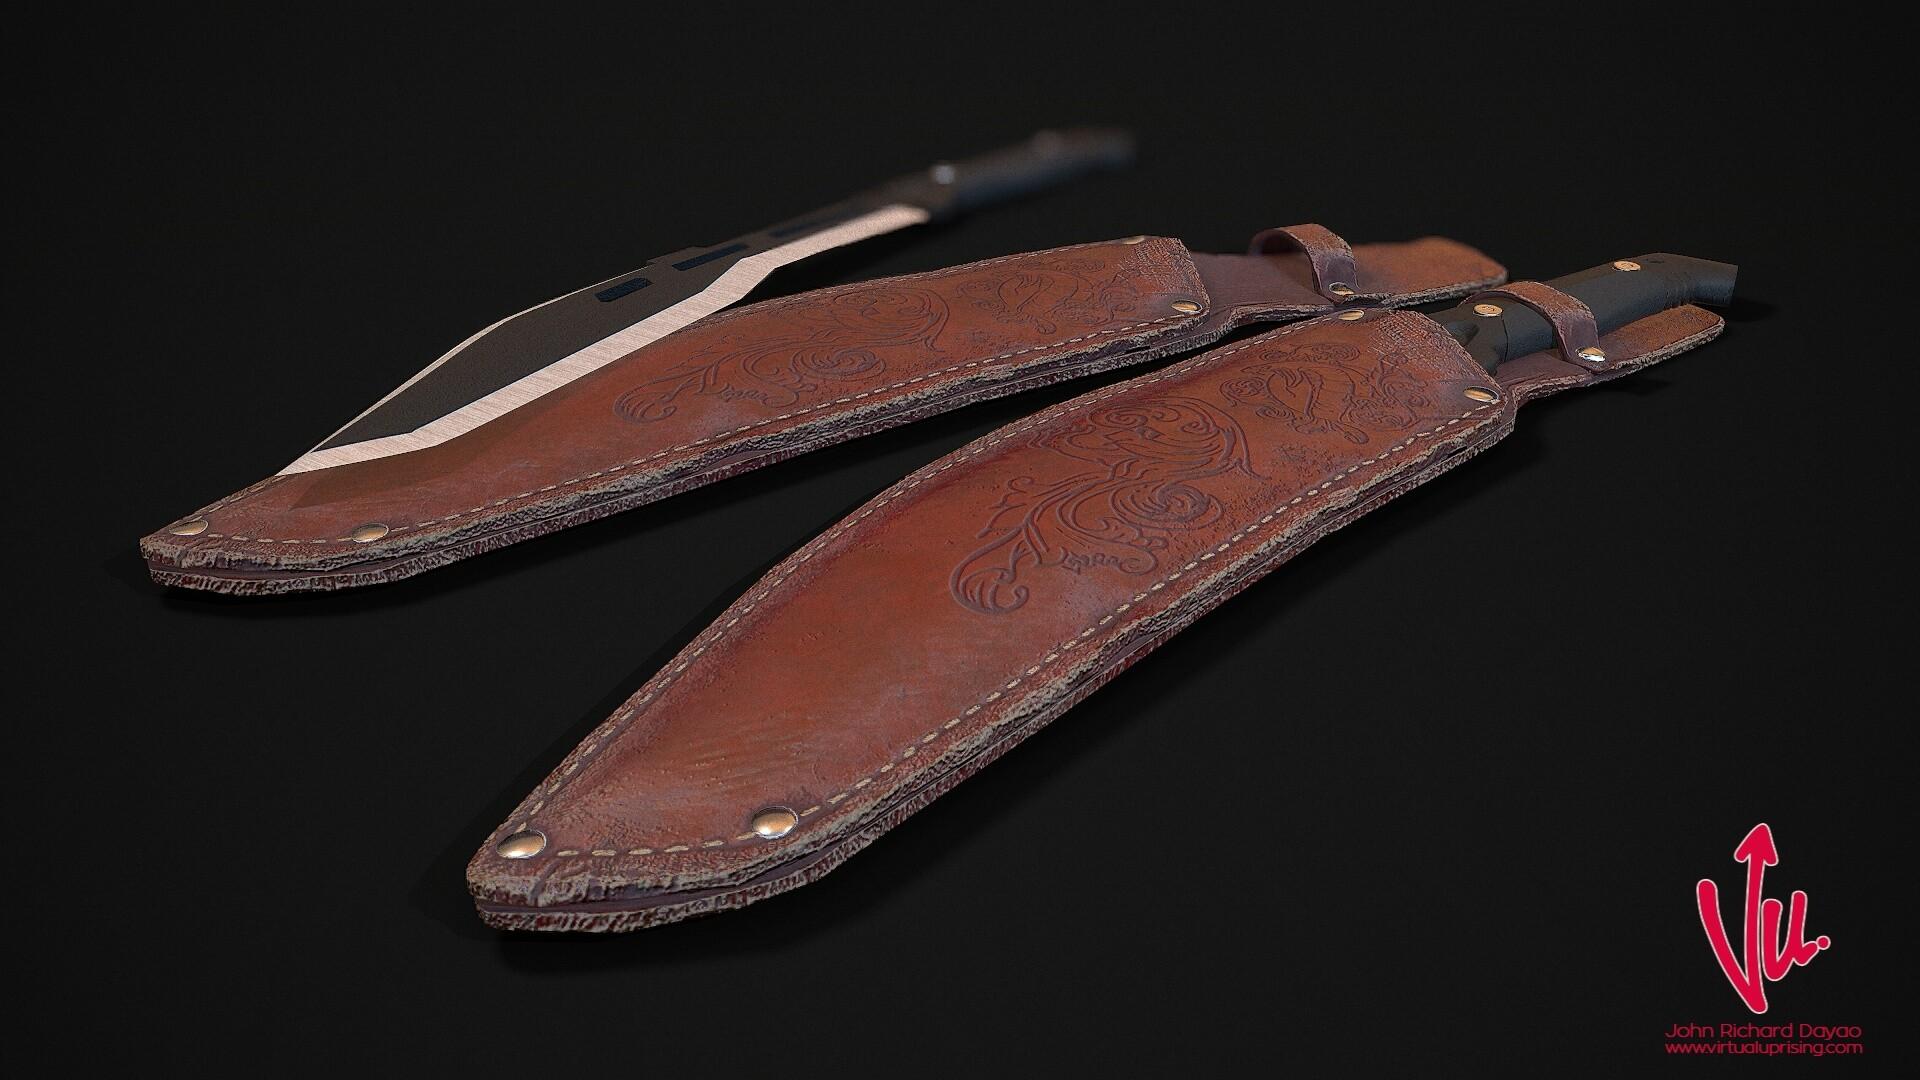 John richard dayao toolbag uplox